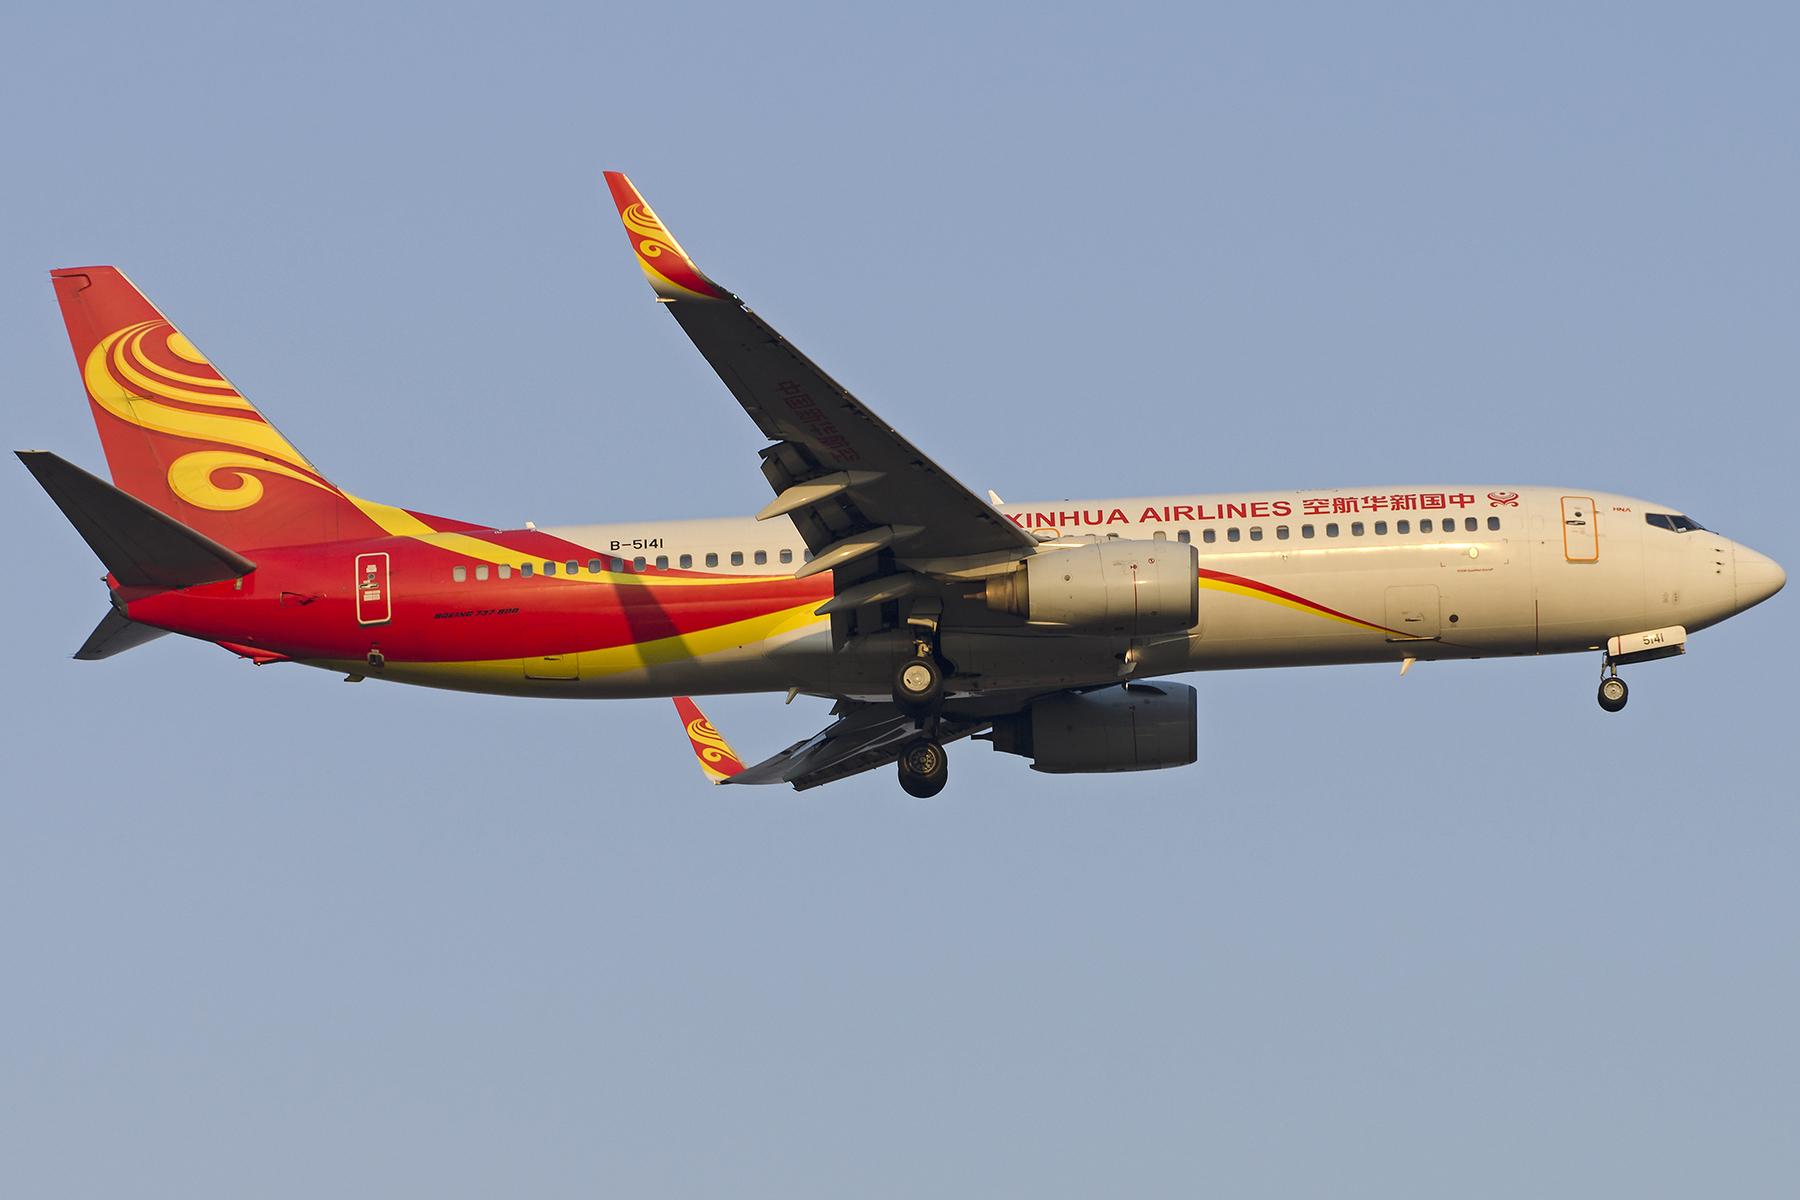 Re:[原创][原创]【PVG】好久没发图了,一堆库存(2)午后 BOEING 737-800 B-5141 中国上海浦东国际机场